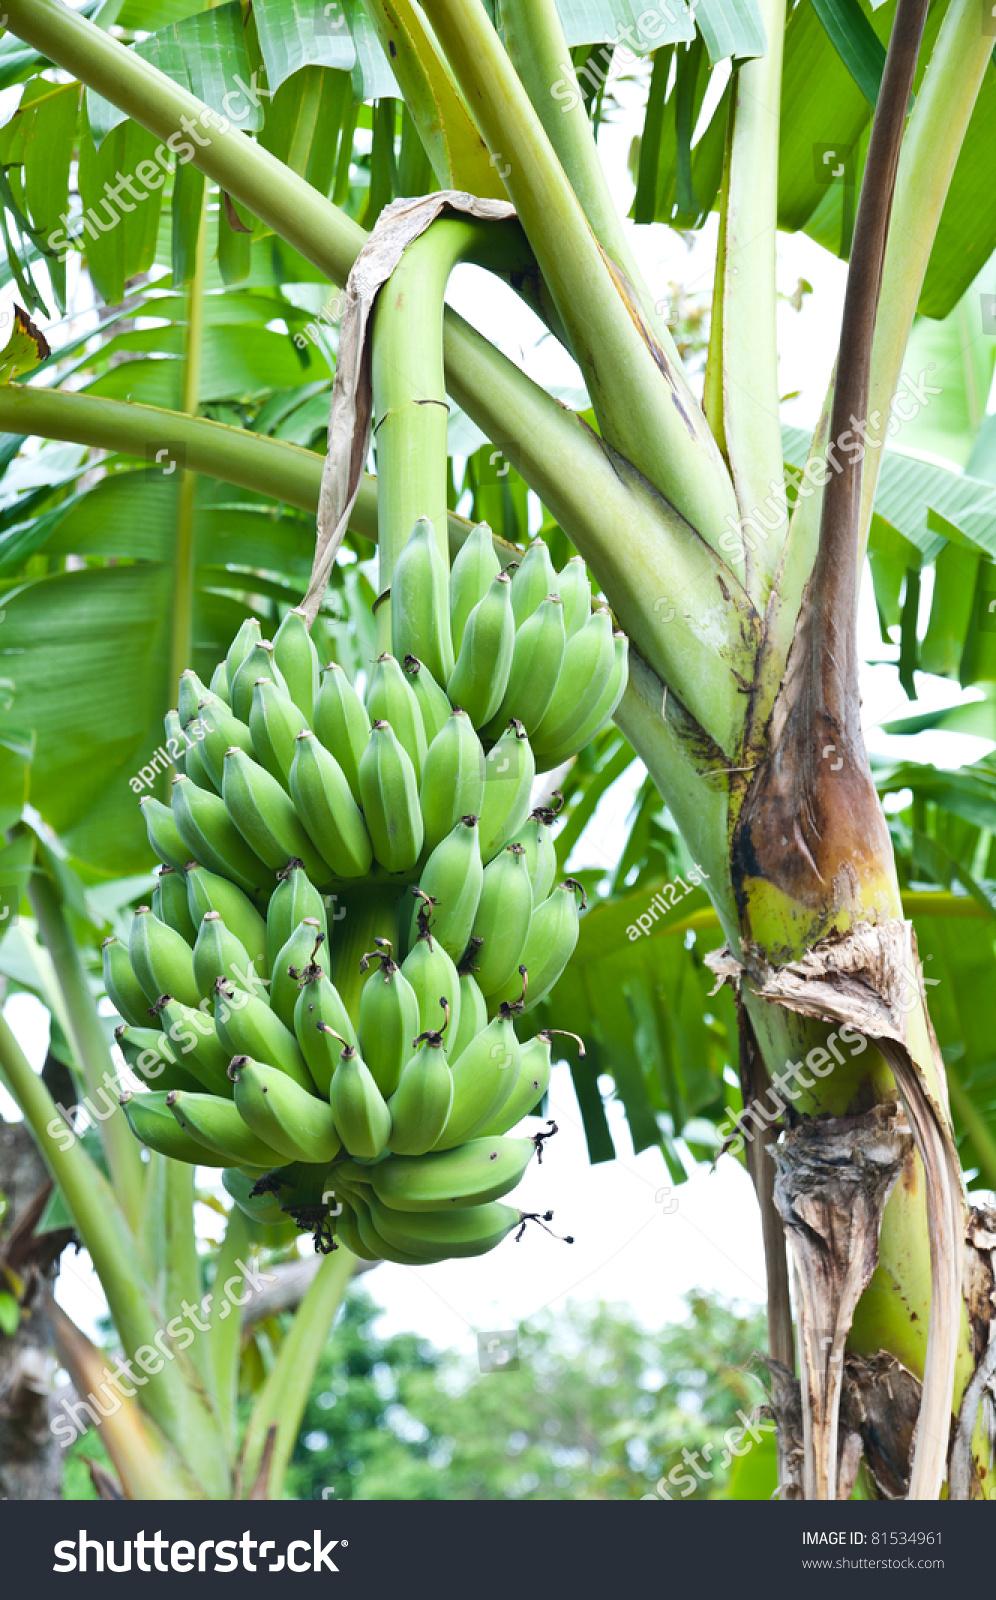 Green Banana Hanging On Brunch Banana Tree Stock Photo ...